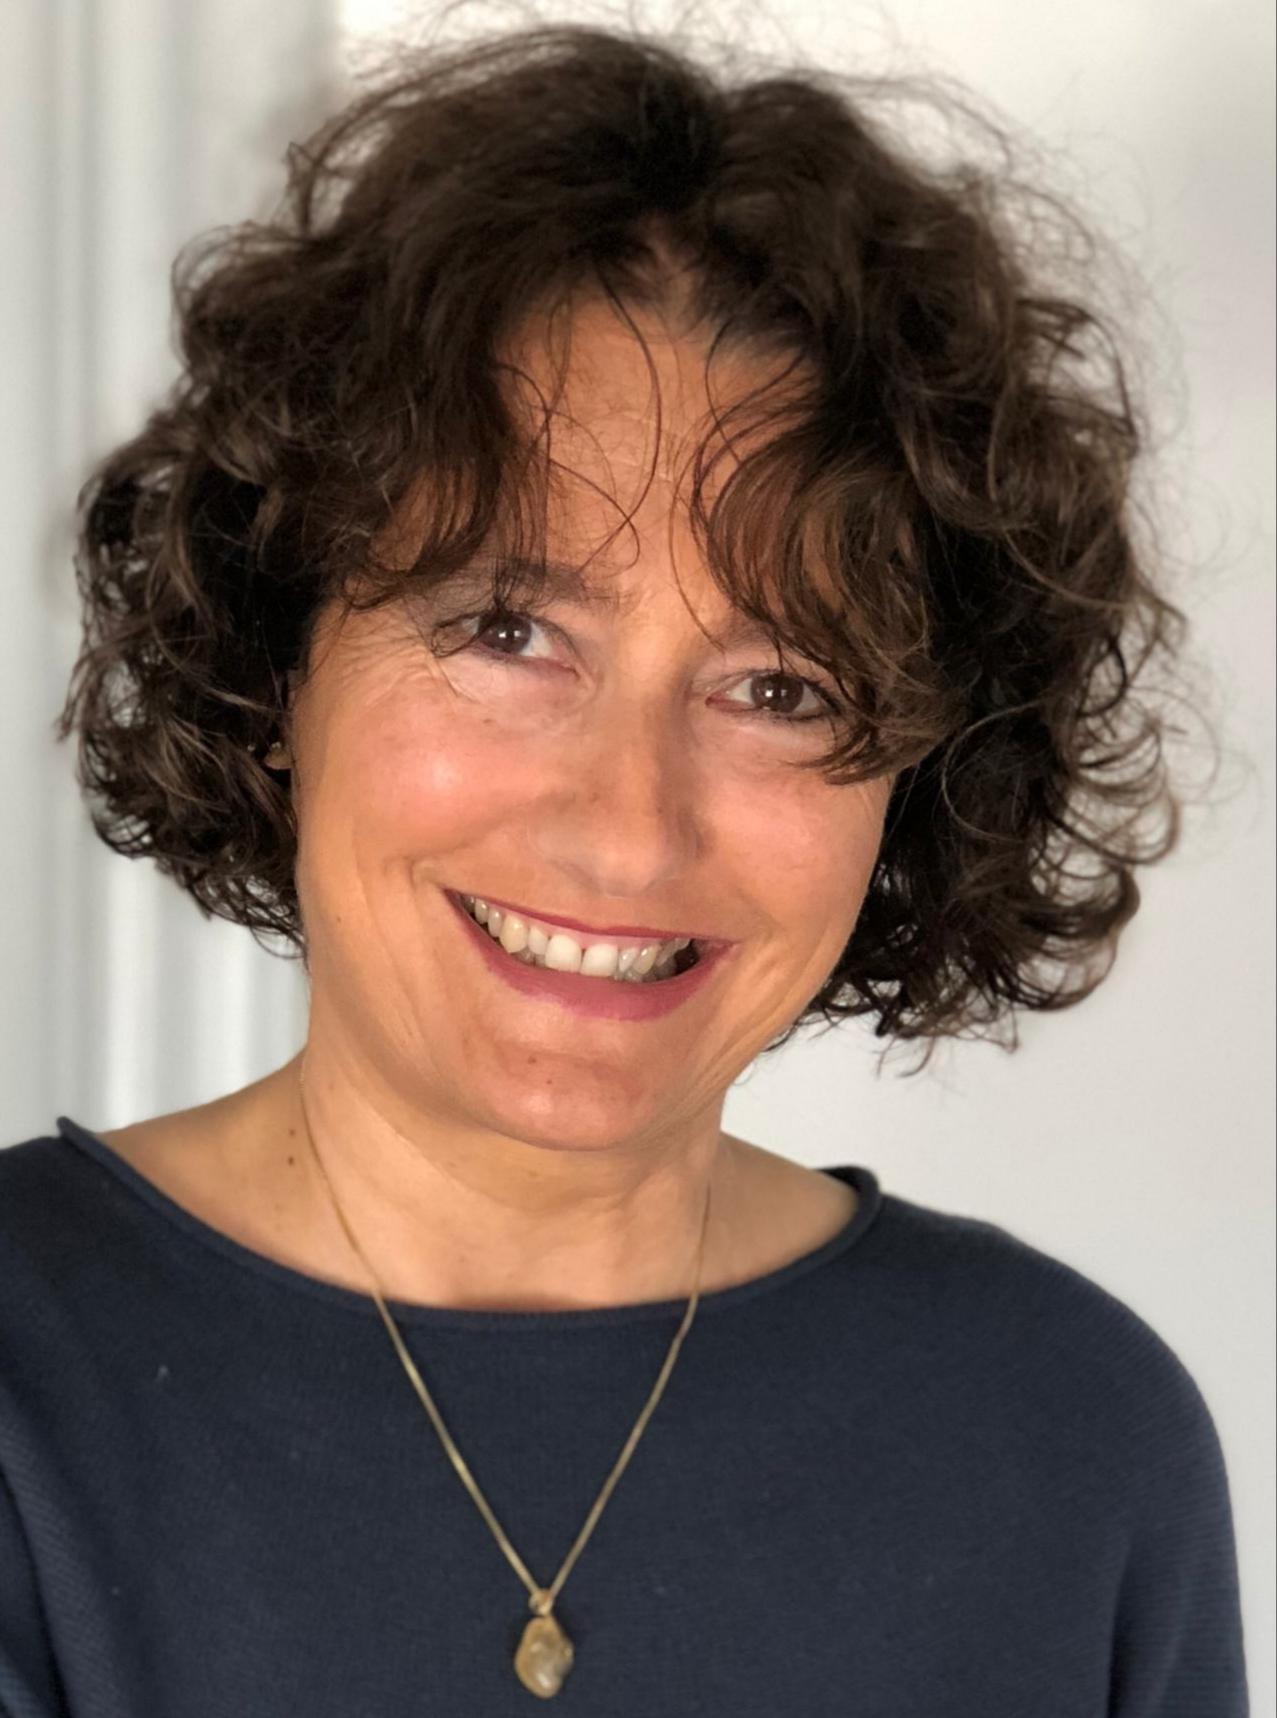 Liliane Blurtschi, blurtschi consulting, Aarau